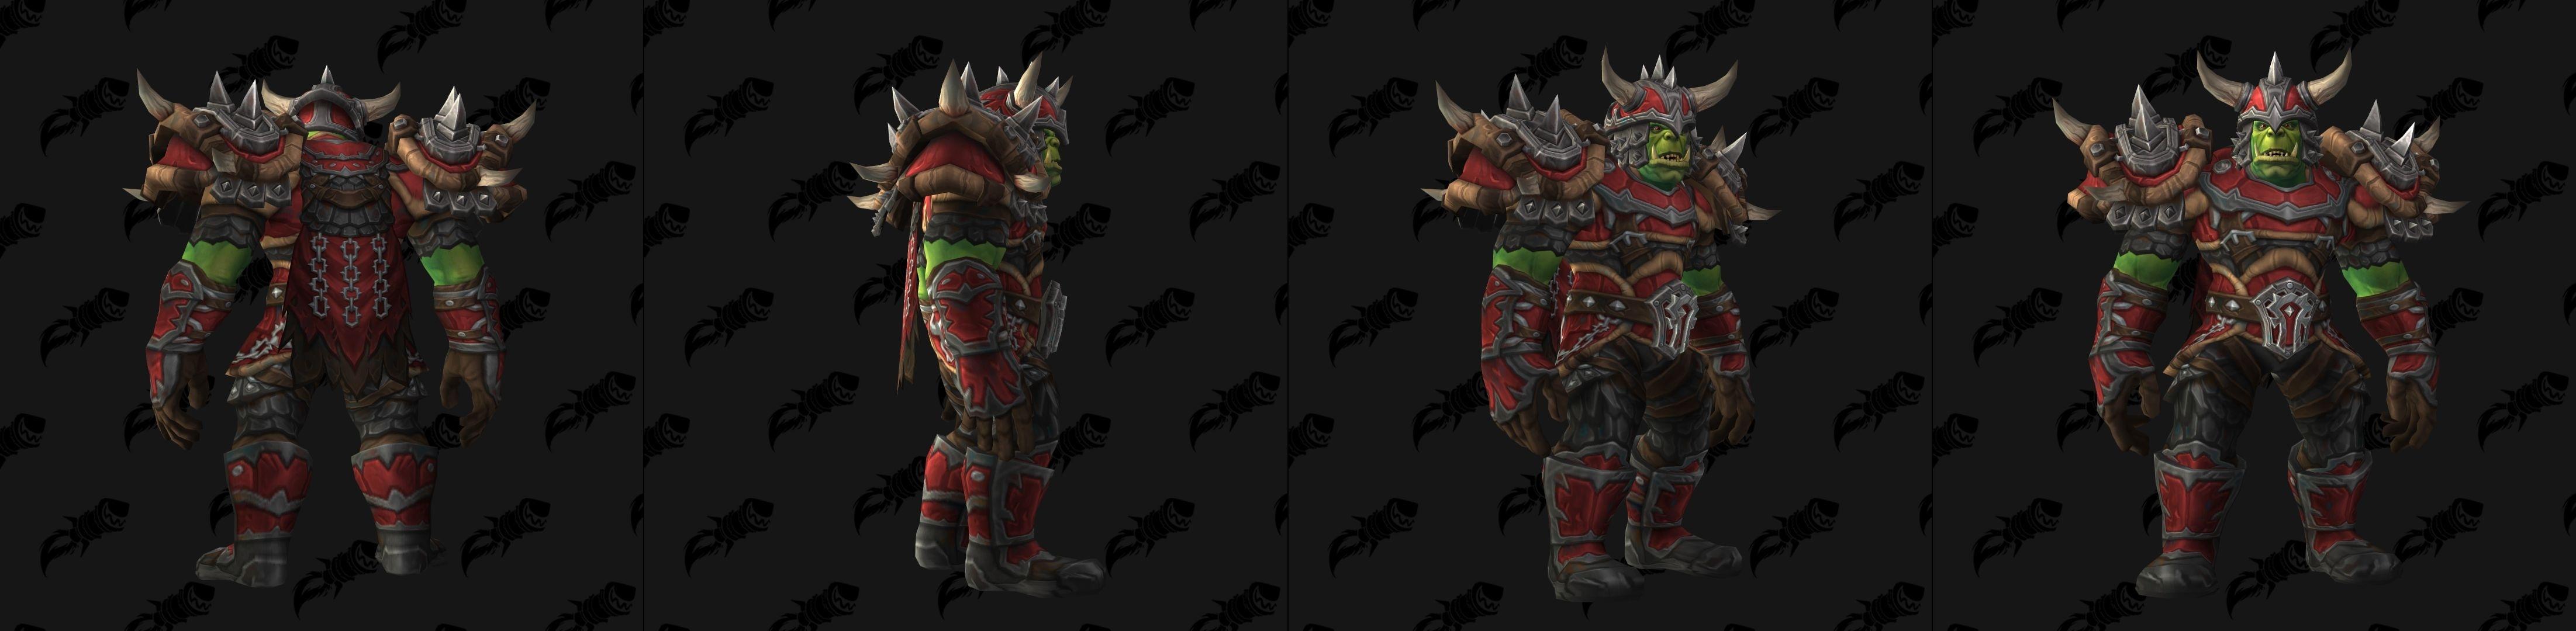 Season 26 Transmog - Dread Gladiator and Aspirant Armor and